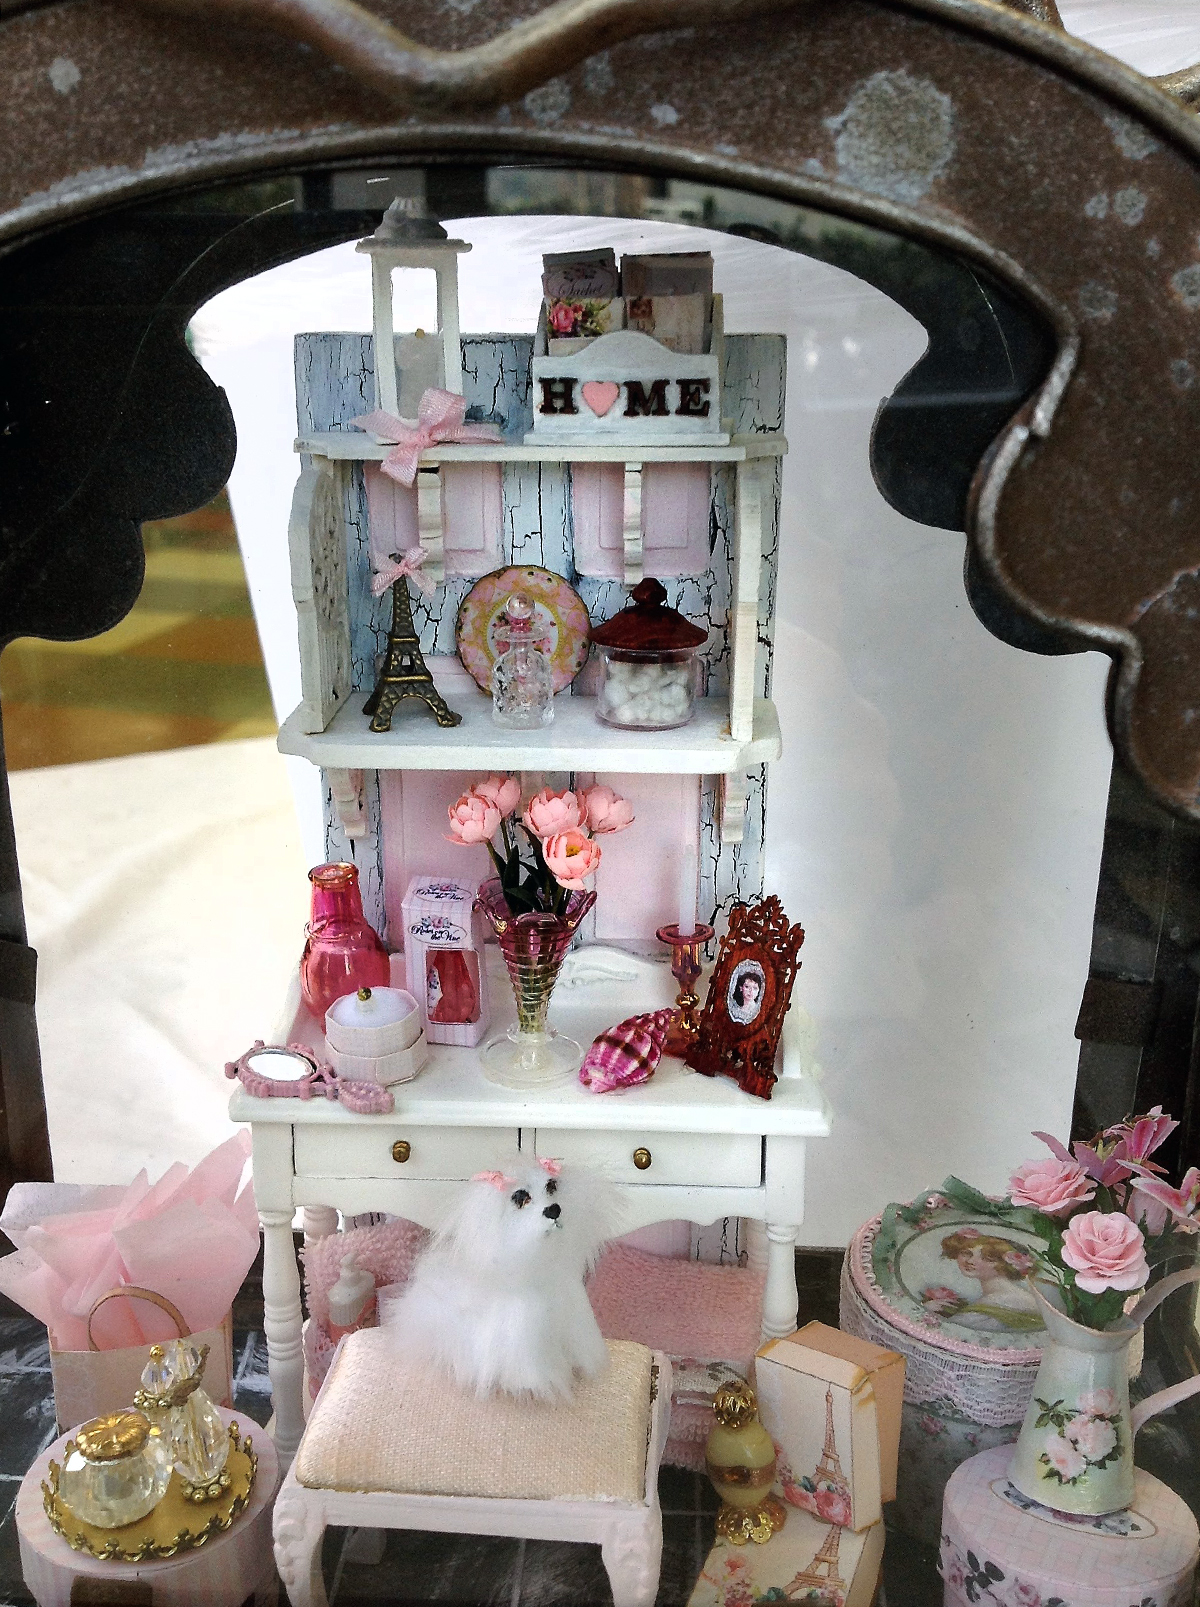 Shabby Chic Shelf Workshop in a Lantern by Juanita Landa